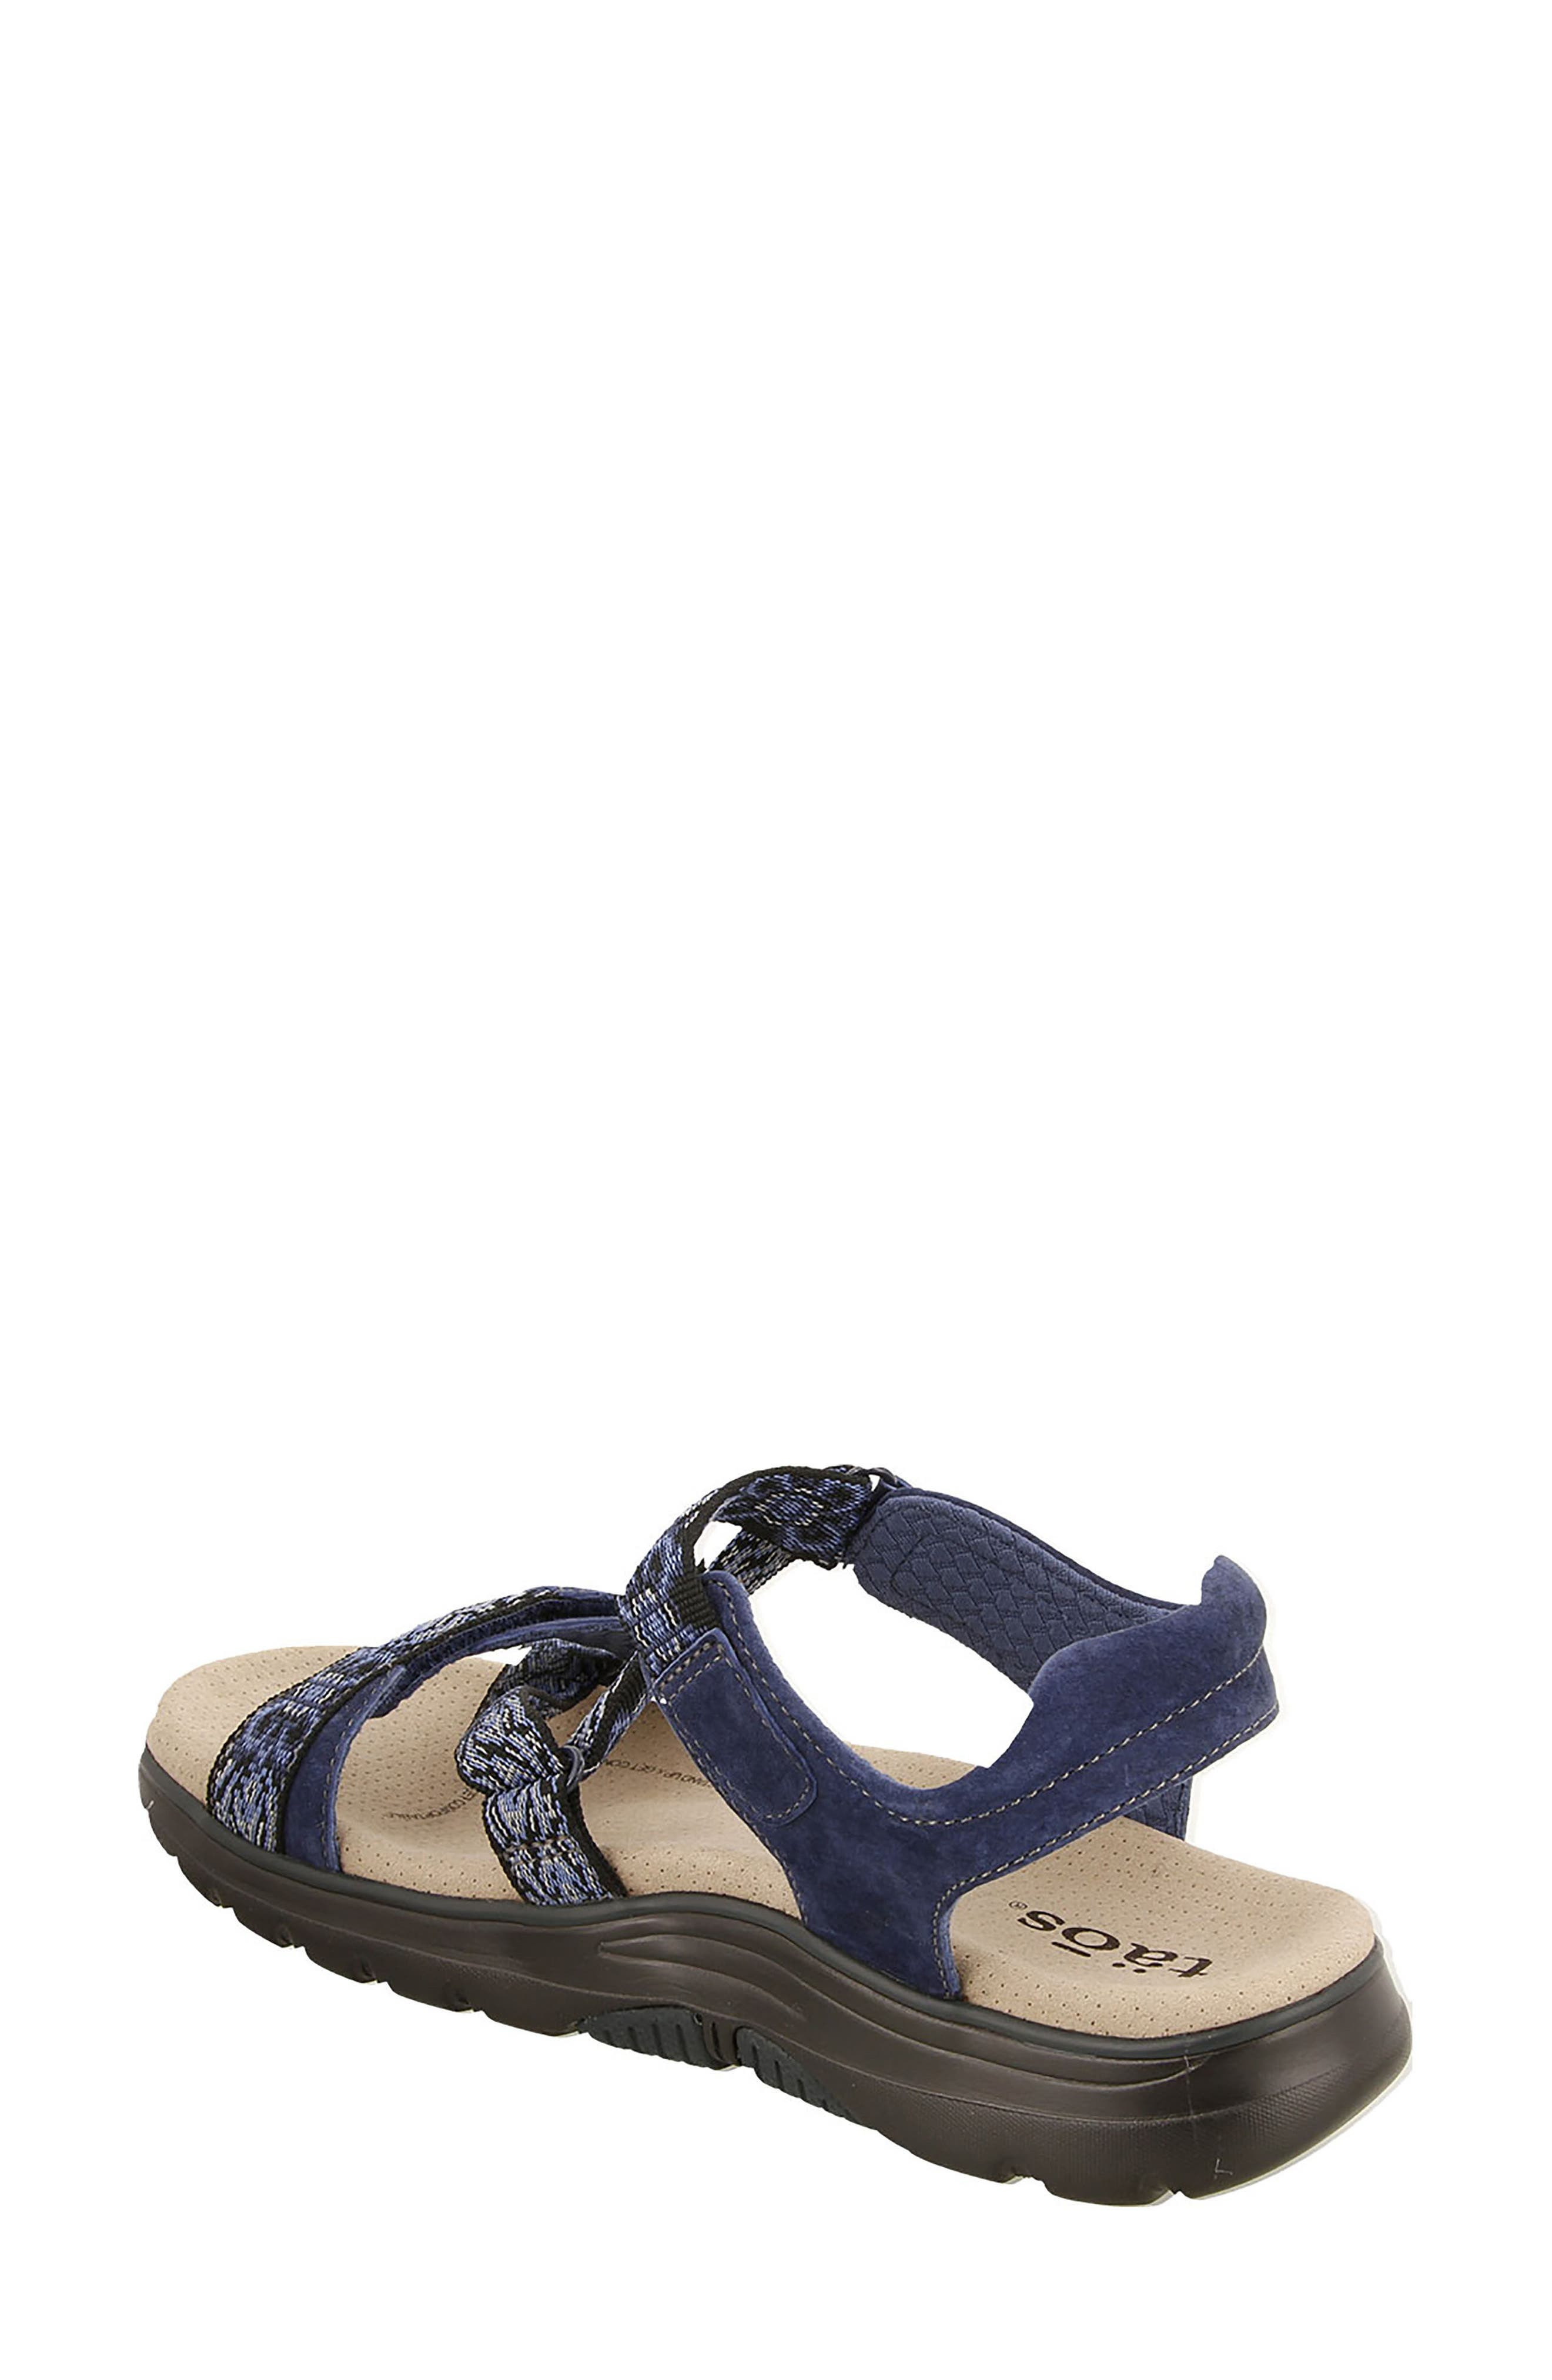 Zen Sandal,                             Alternate thumbnail 2, color,                             Navy/ Blue Leather